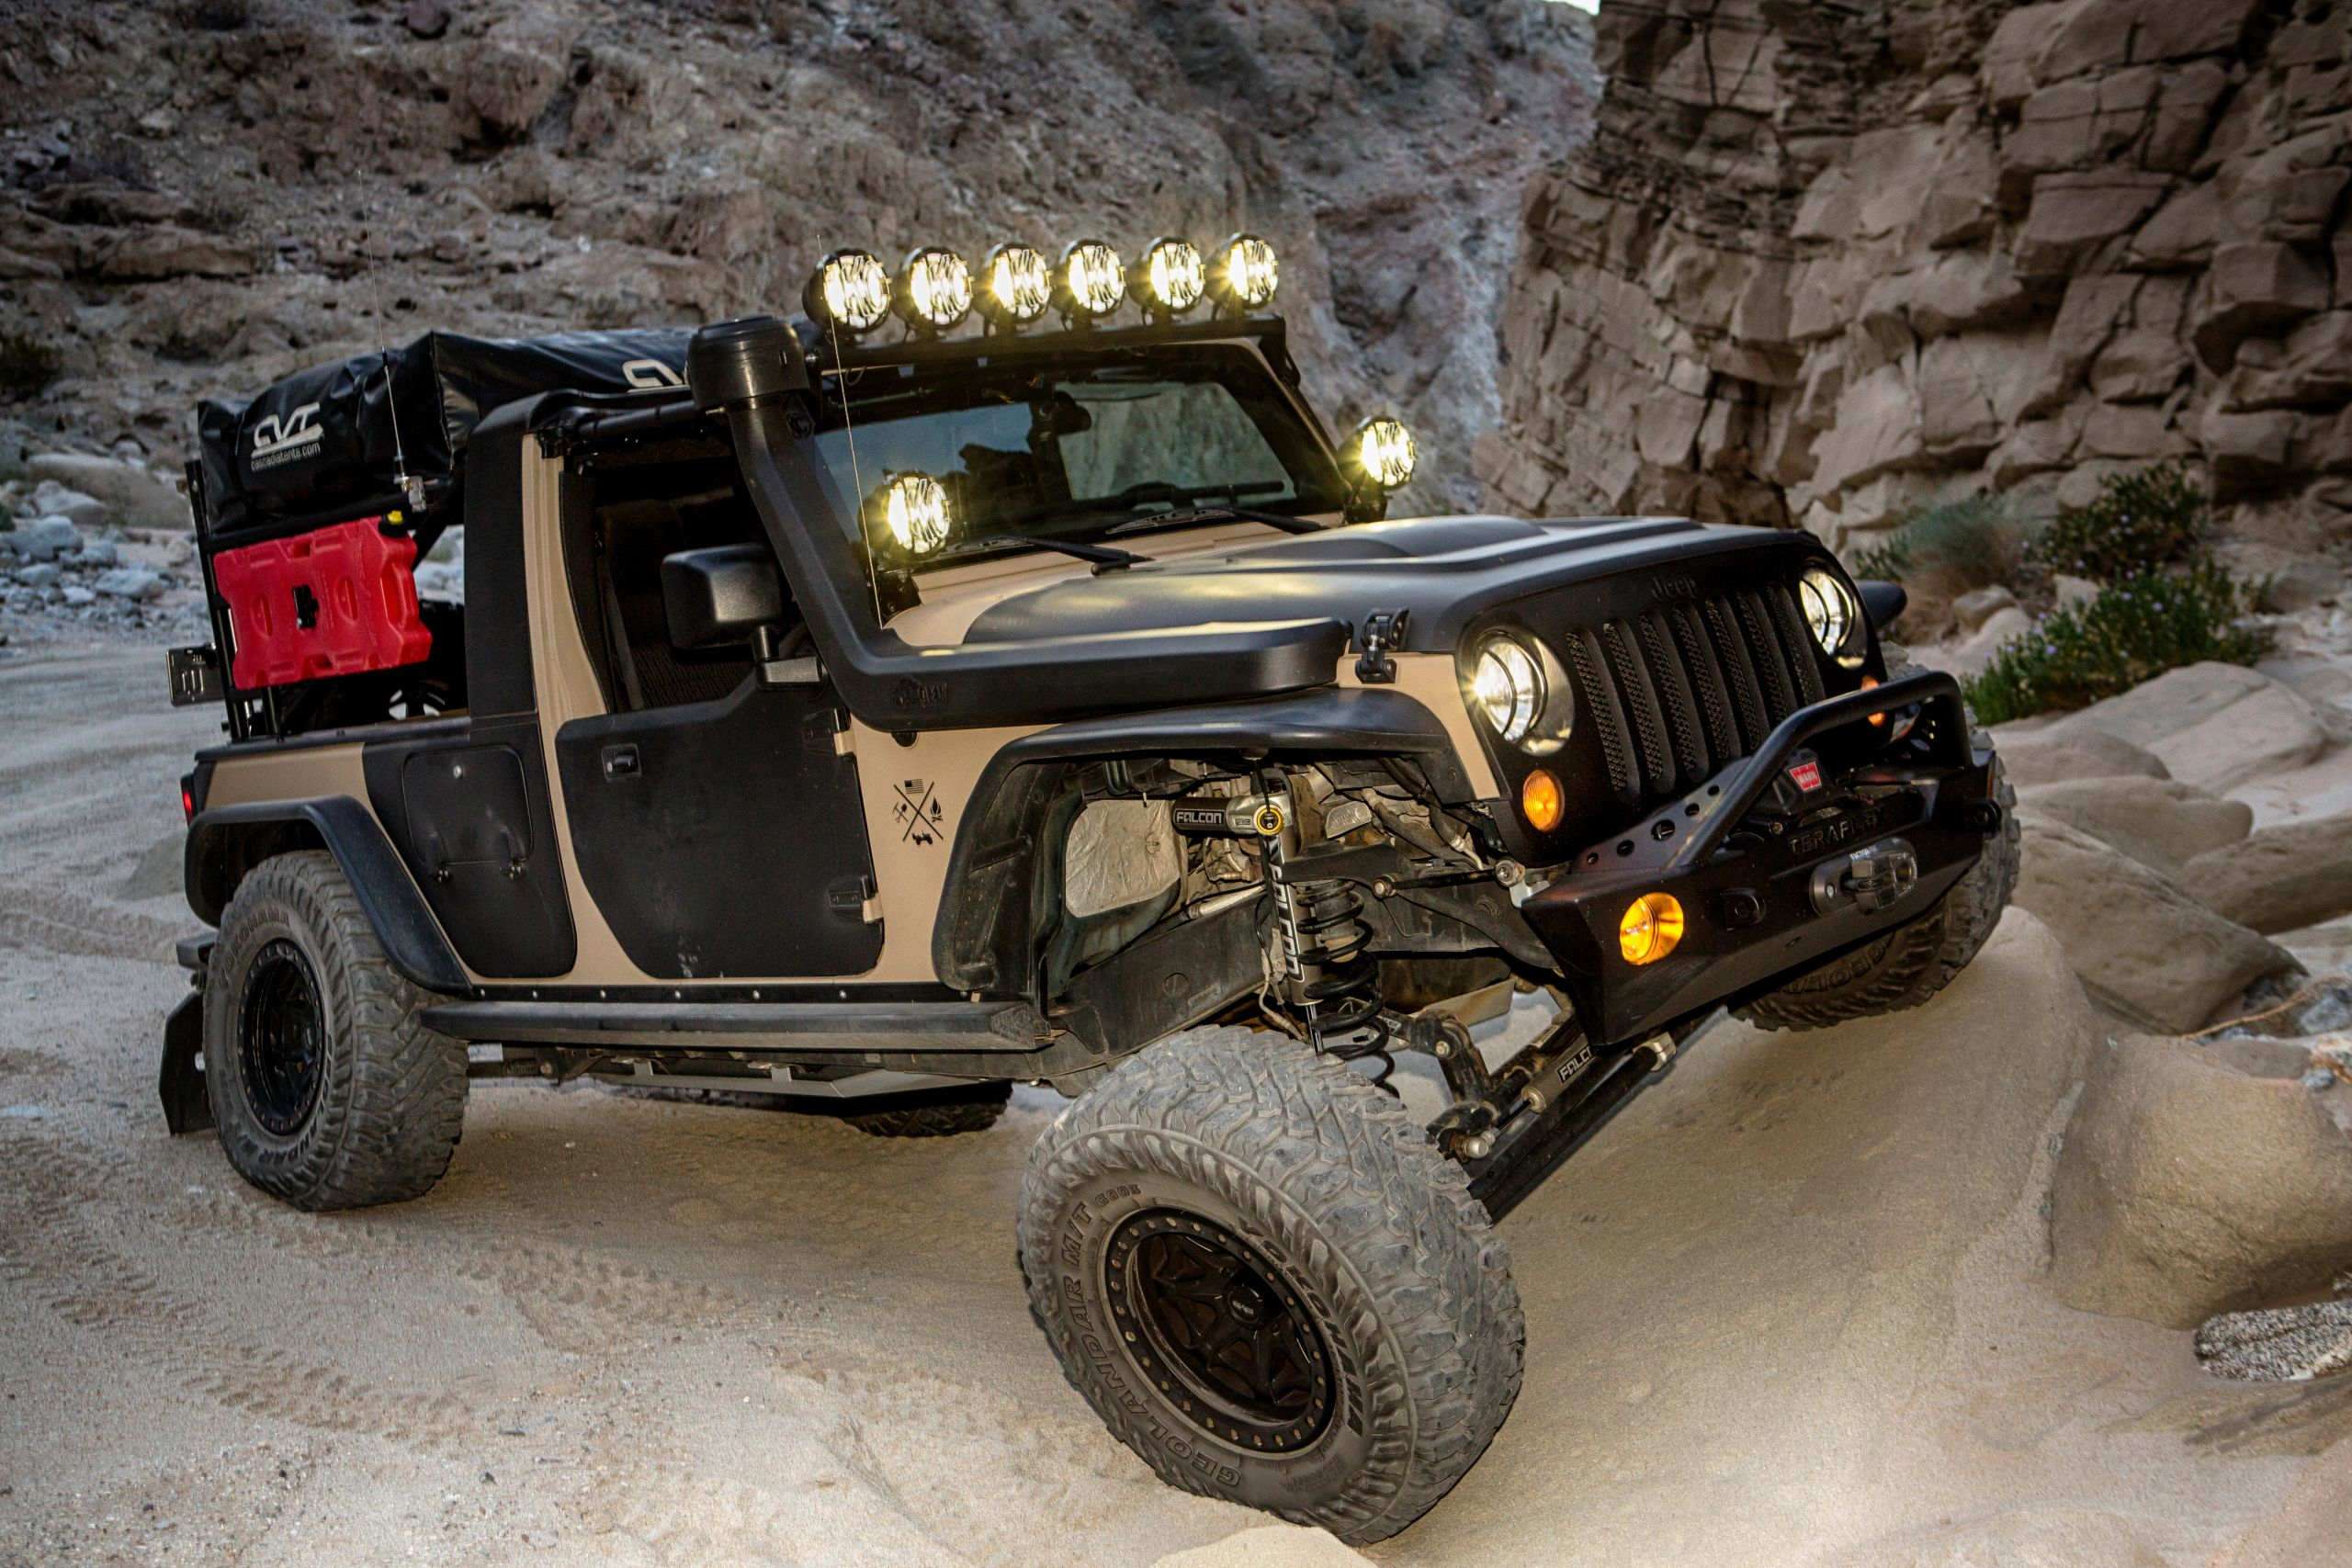 Custom Off Road, Overlanding & Camping Jeep JK Build - Image #01